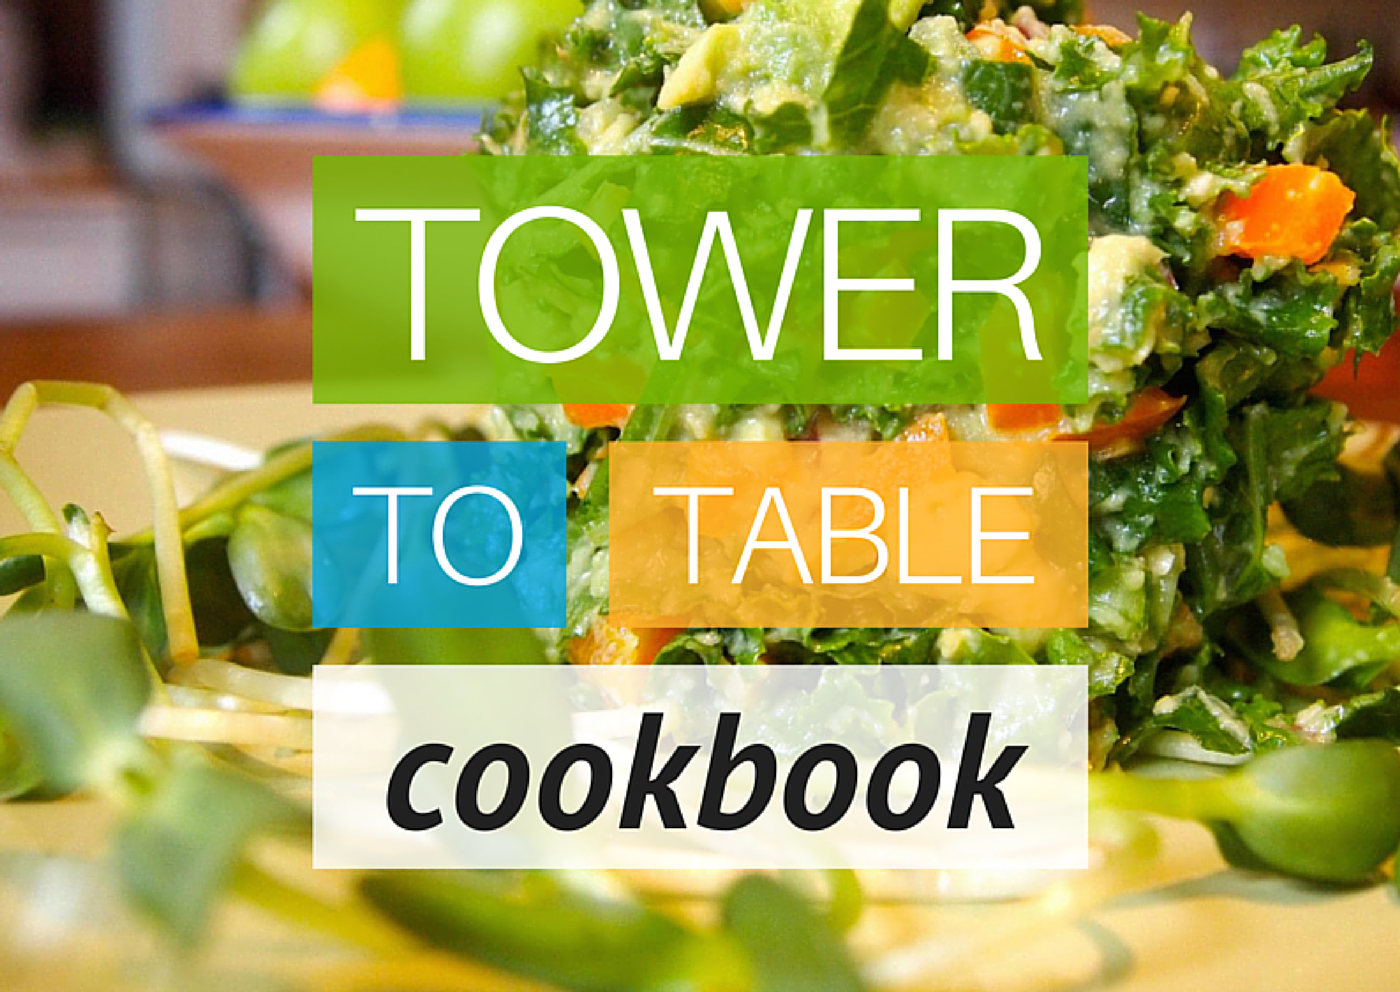 Tower garden cookbook pdf i found my dl here httpwww organic vegetables forumfinder Image collections